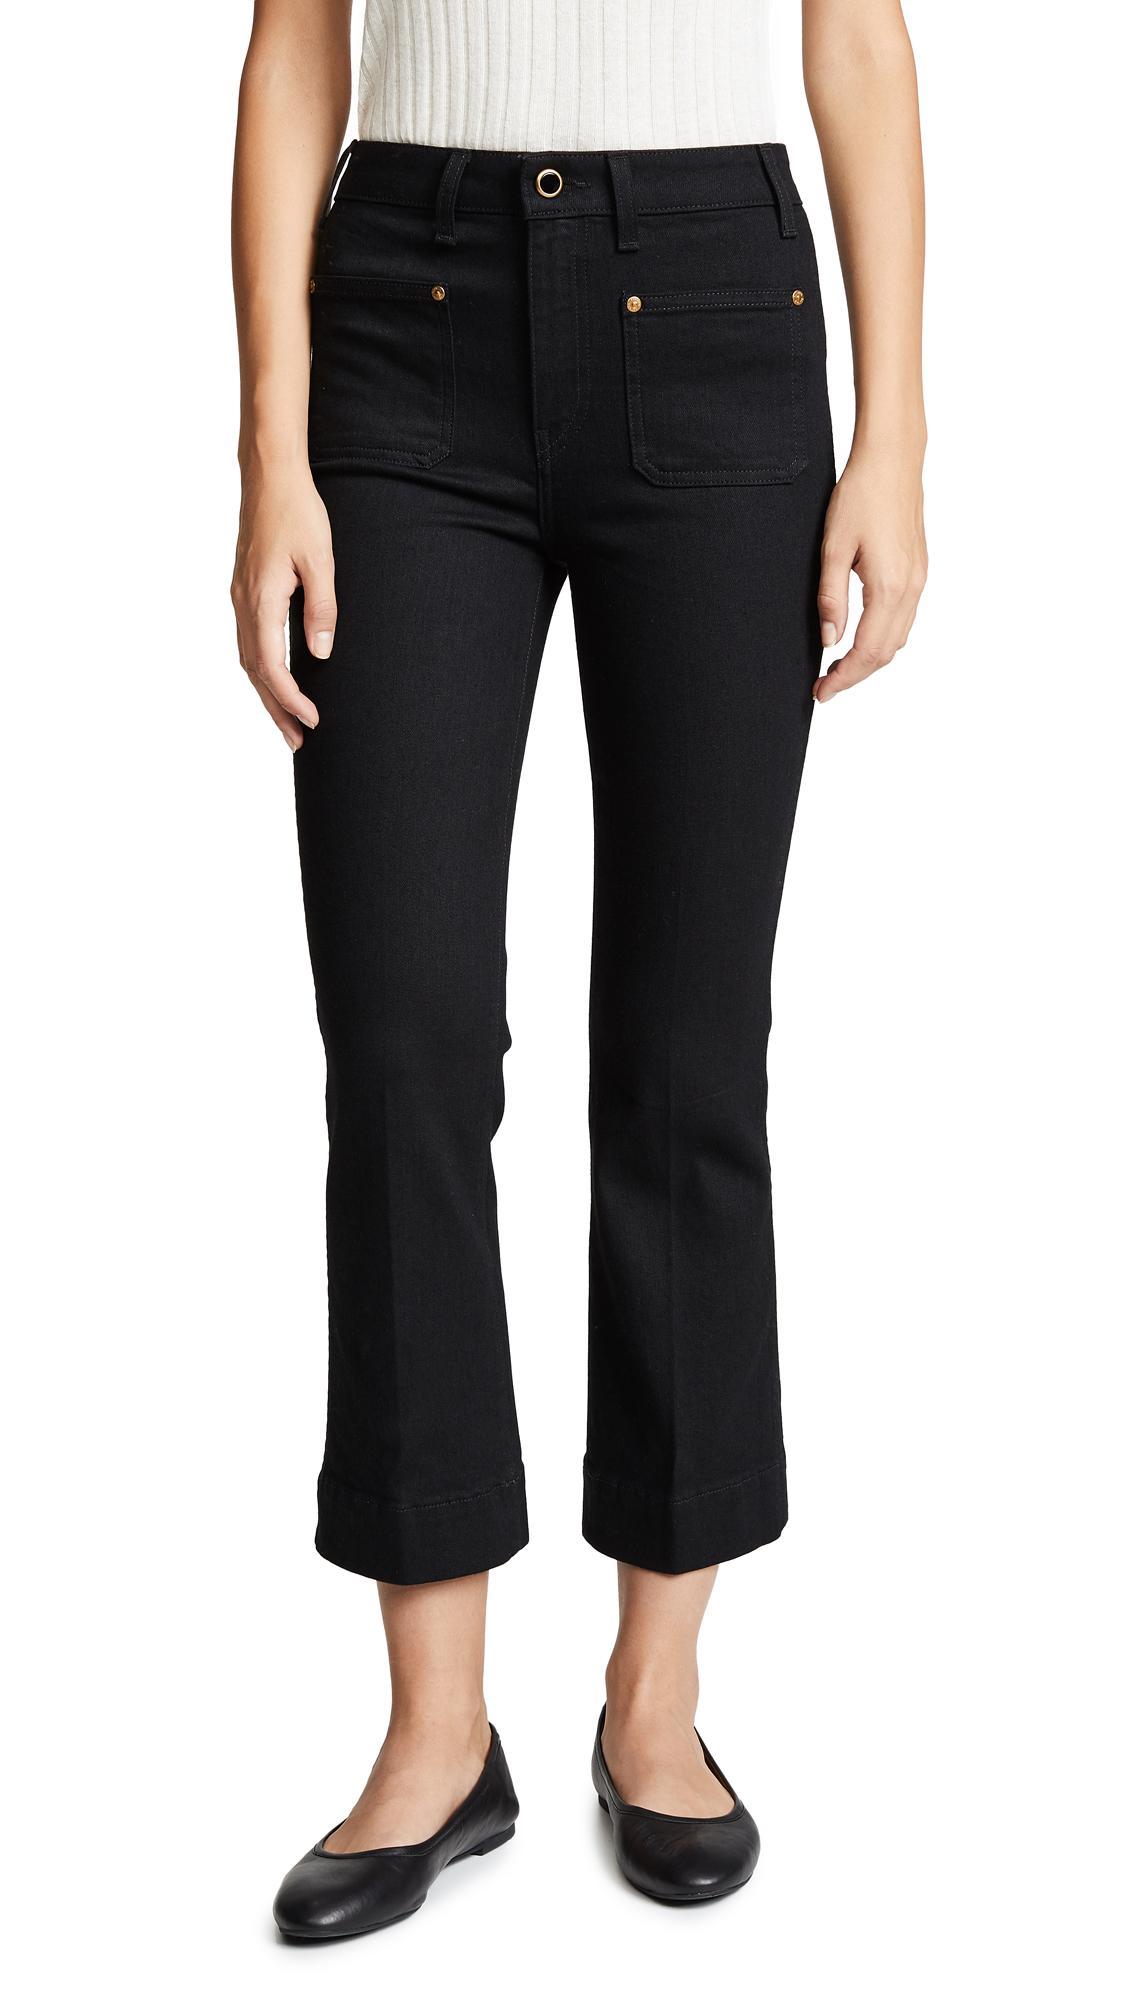 Khaite Raquel Patch Pocket Cropped Flare Jeans In Black